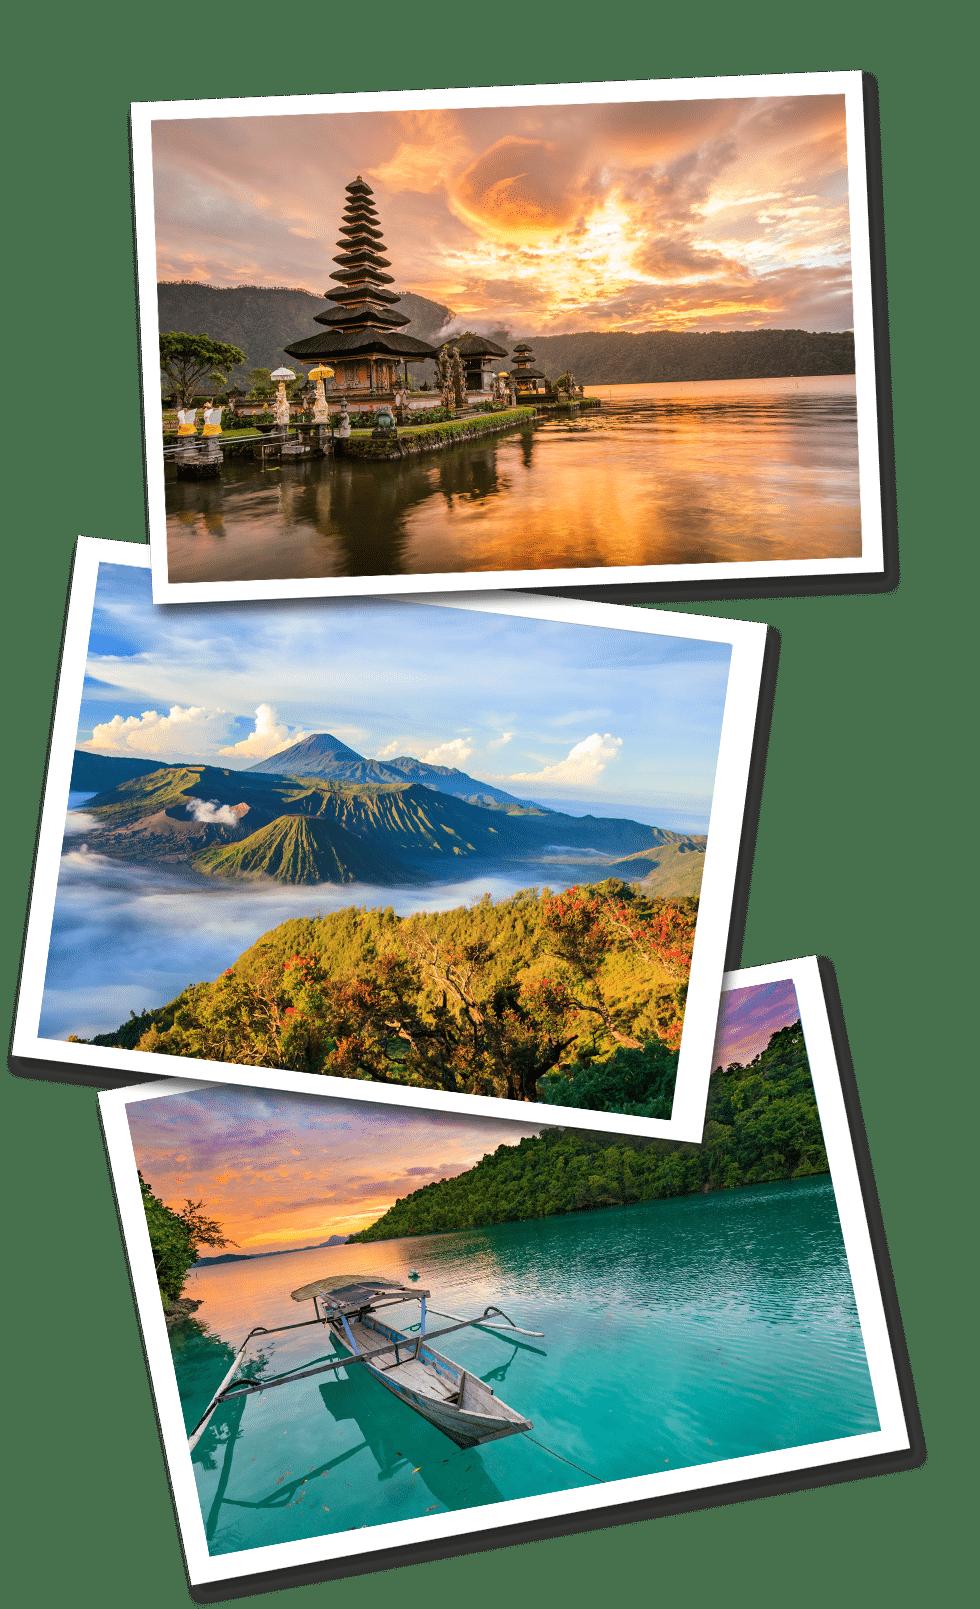 Indonesia Postcard desktop